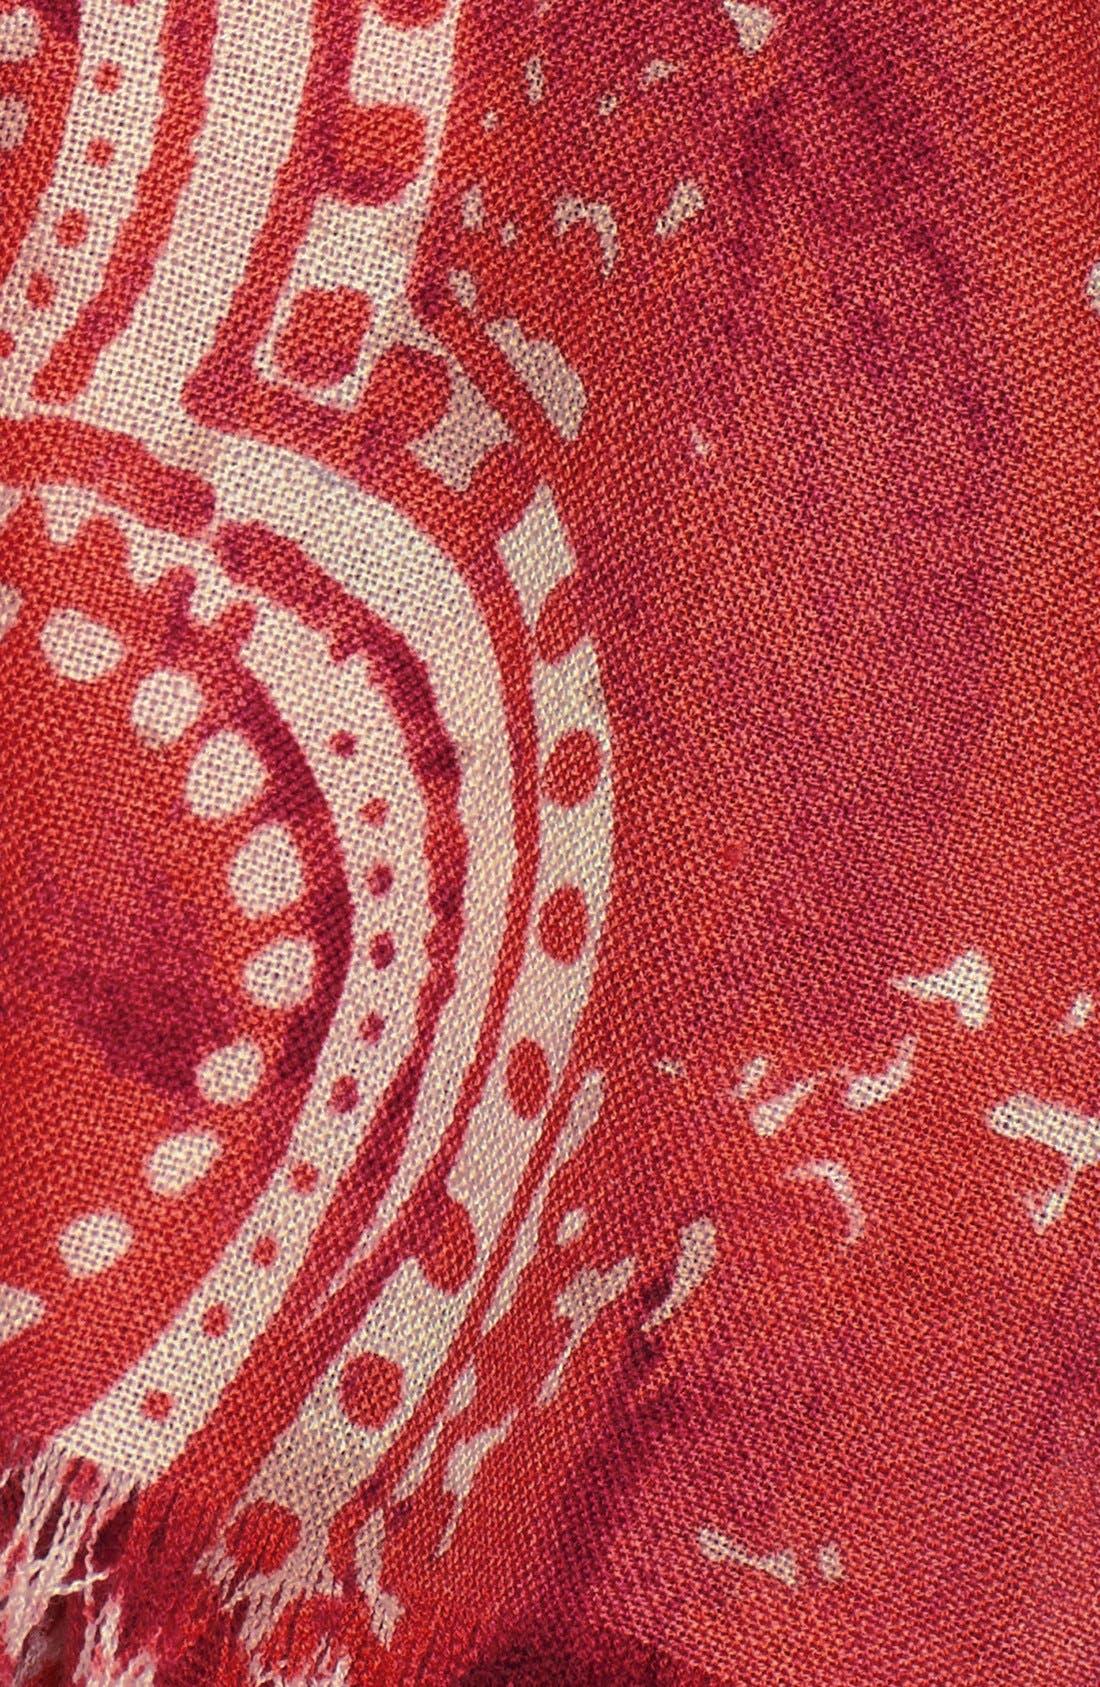 Alternate Image 2  - Nordstrom 'Baroque Floral' Wool Scarf